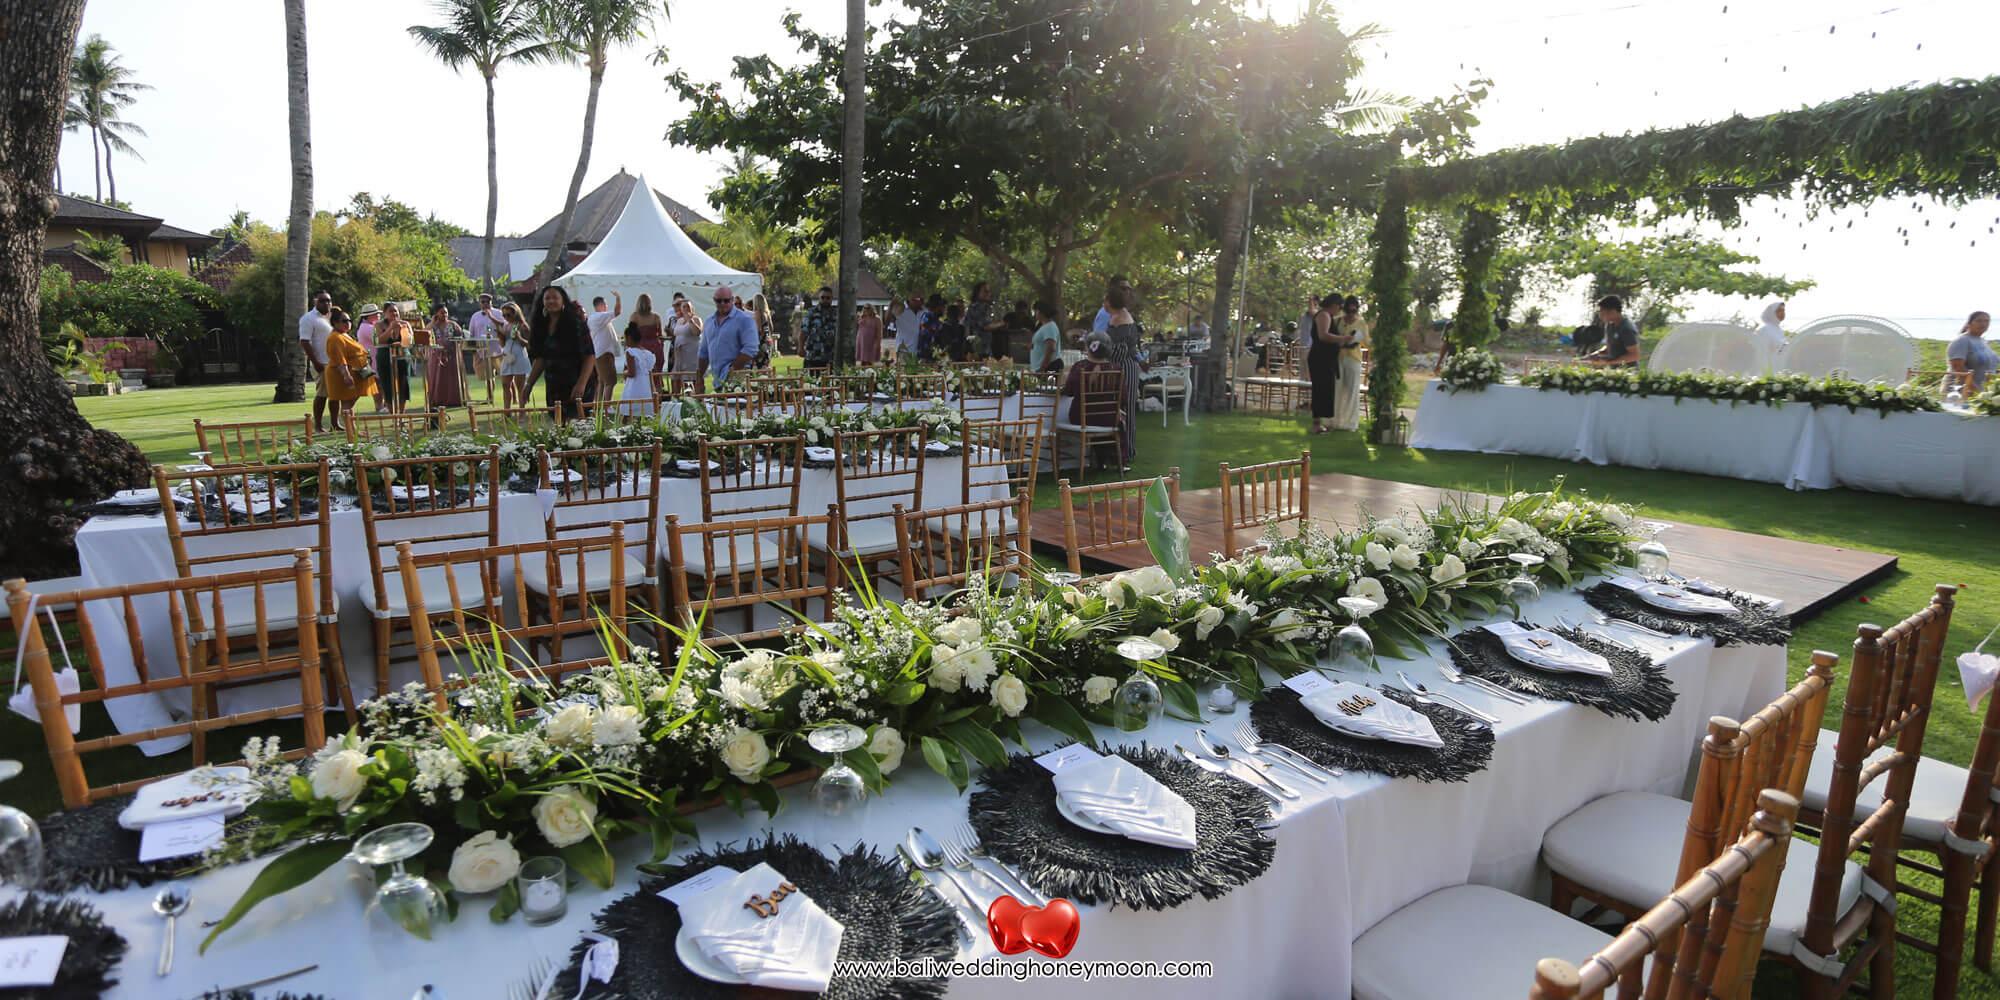 belmondjimbaranbali-weddingvenuebali-uniquebaliwedding-baliweddinghoneymoon-baliweddingorganizer-baliweddingplanner-baliweddingpackage3